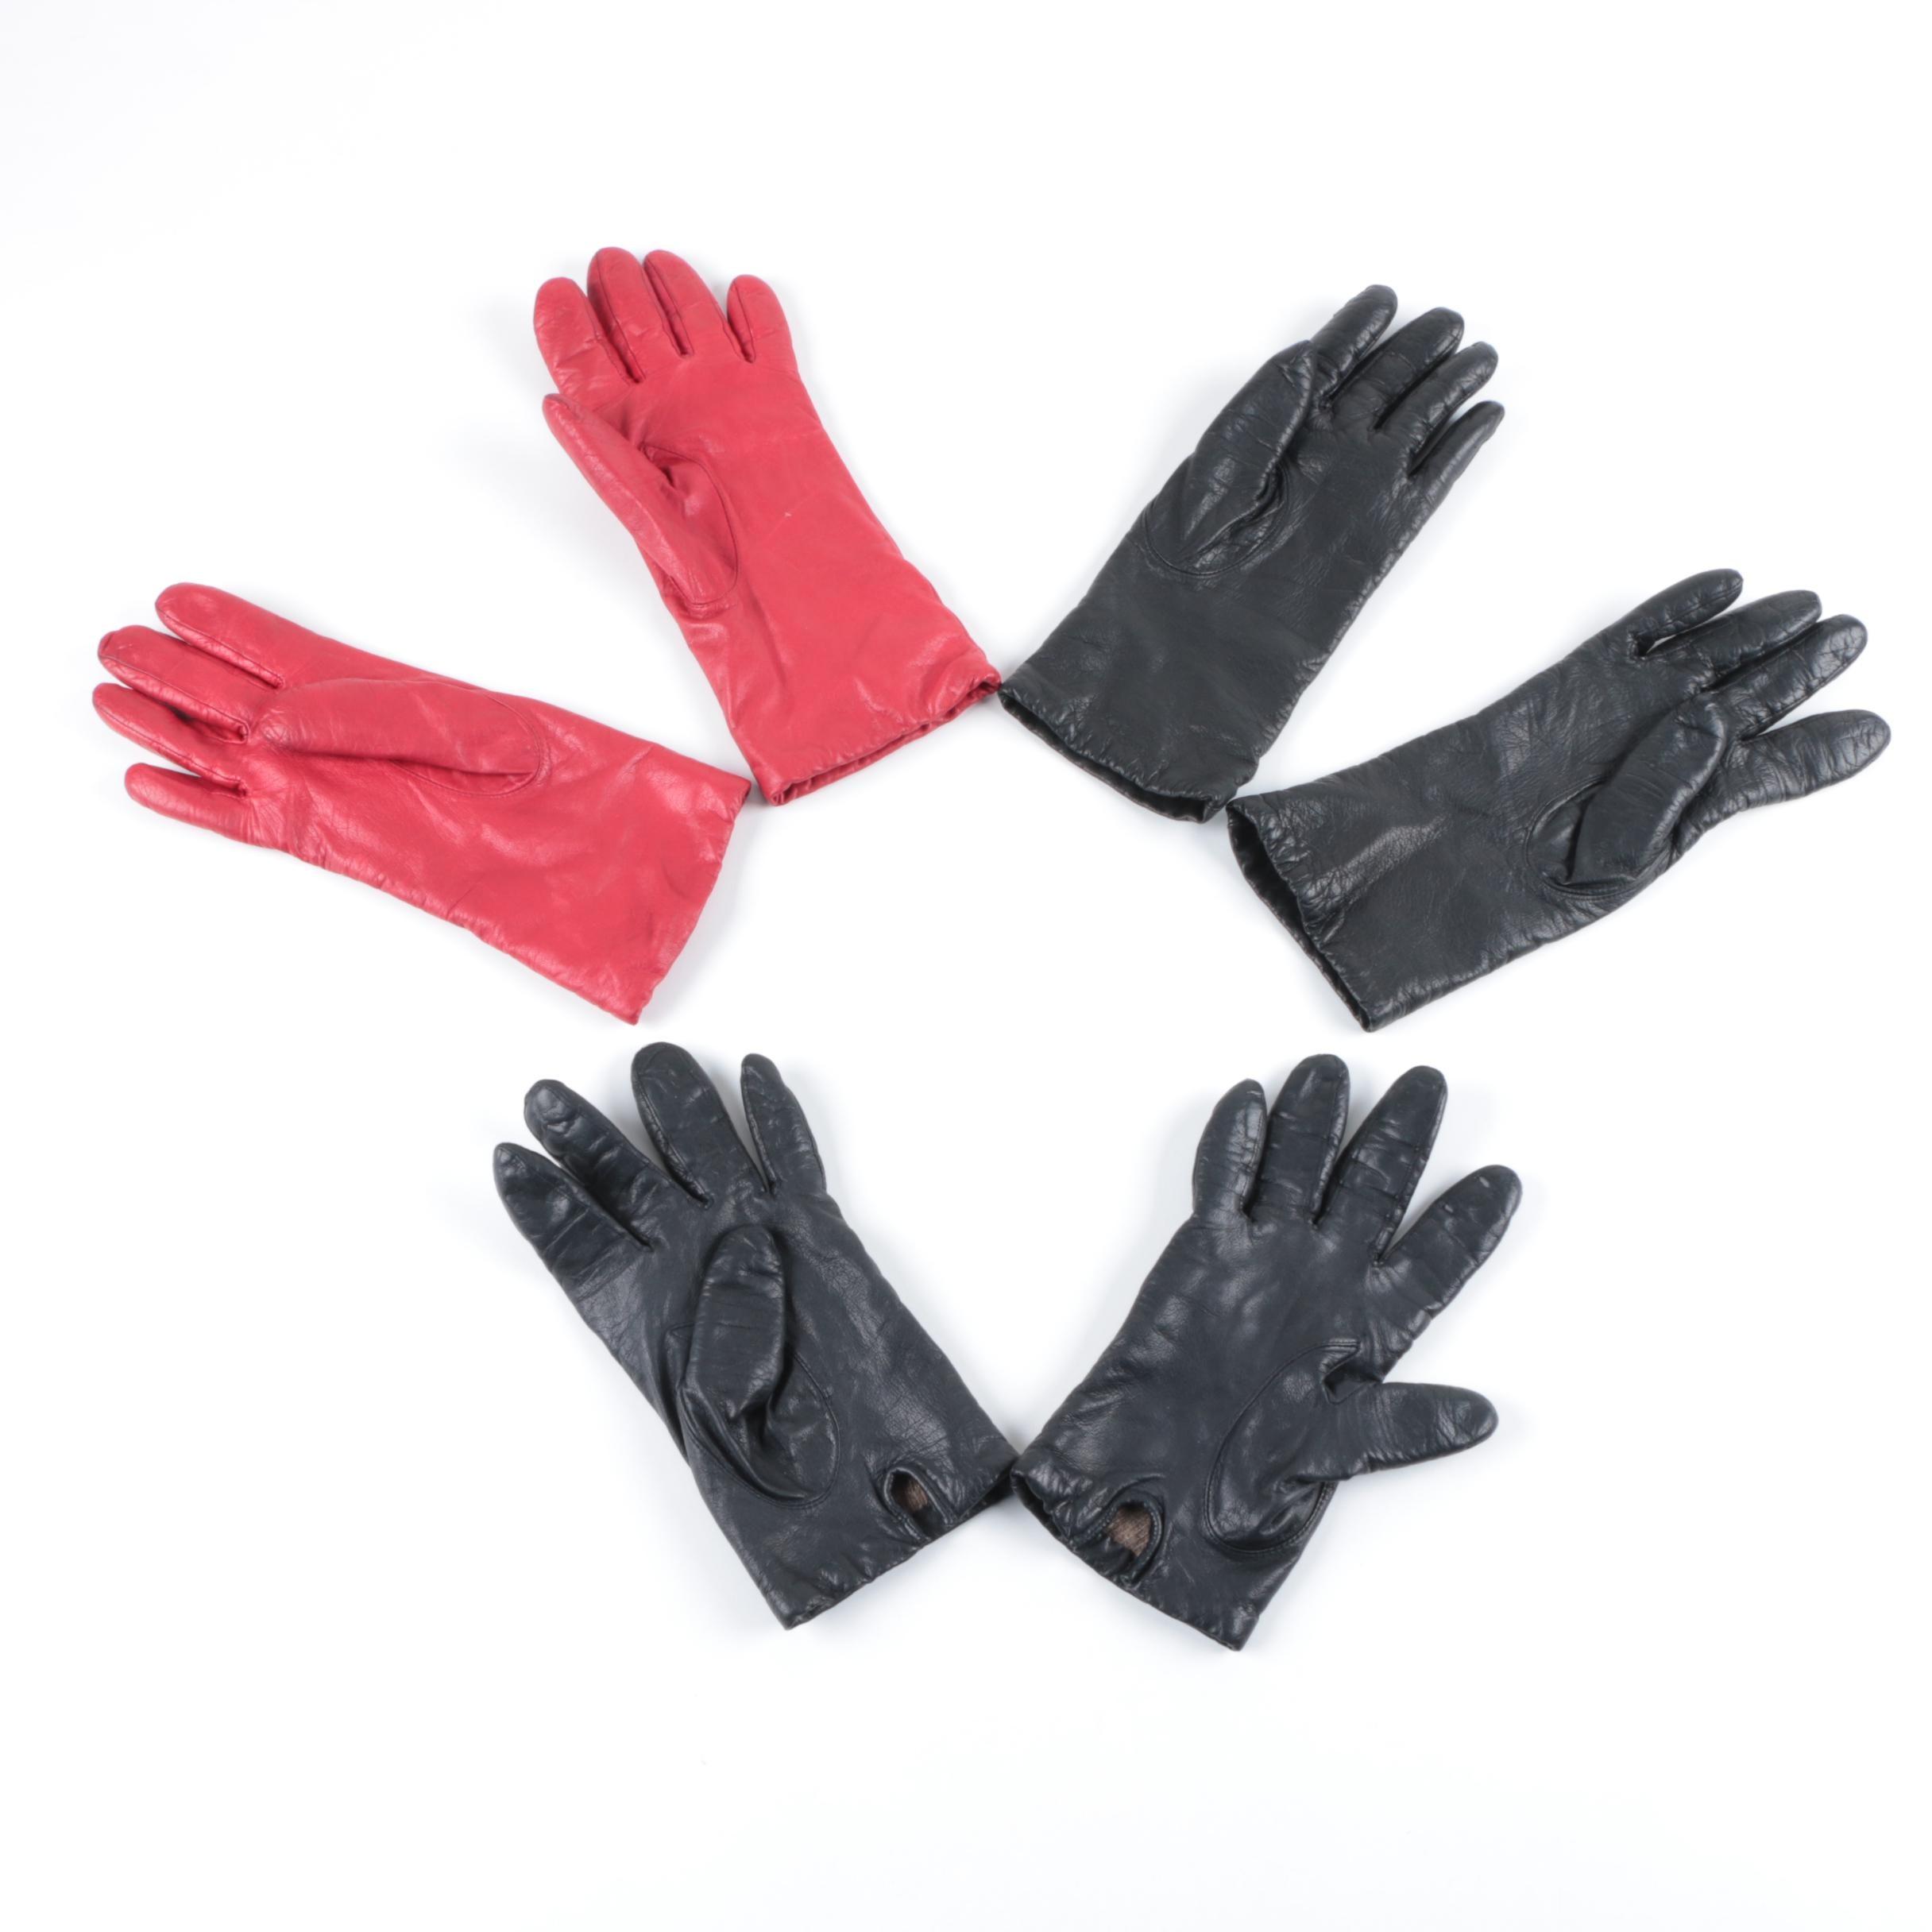 Women's Vintage Leather Gloves, Fur and Faux Fur Earmuffs